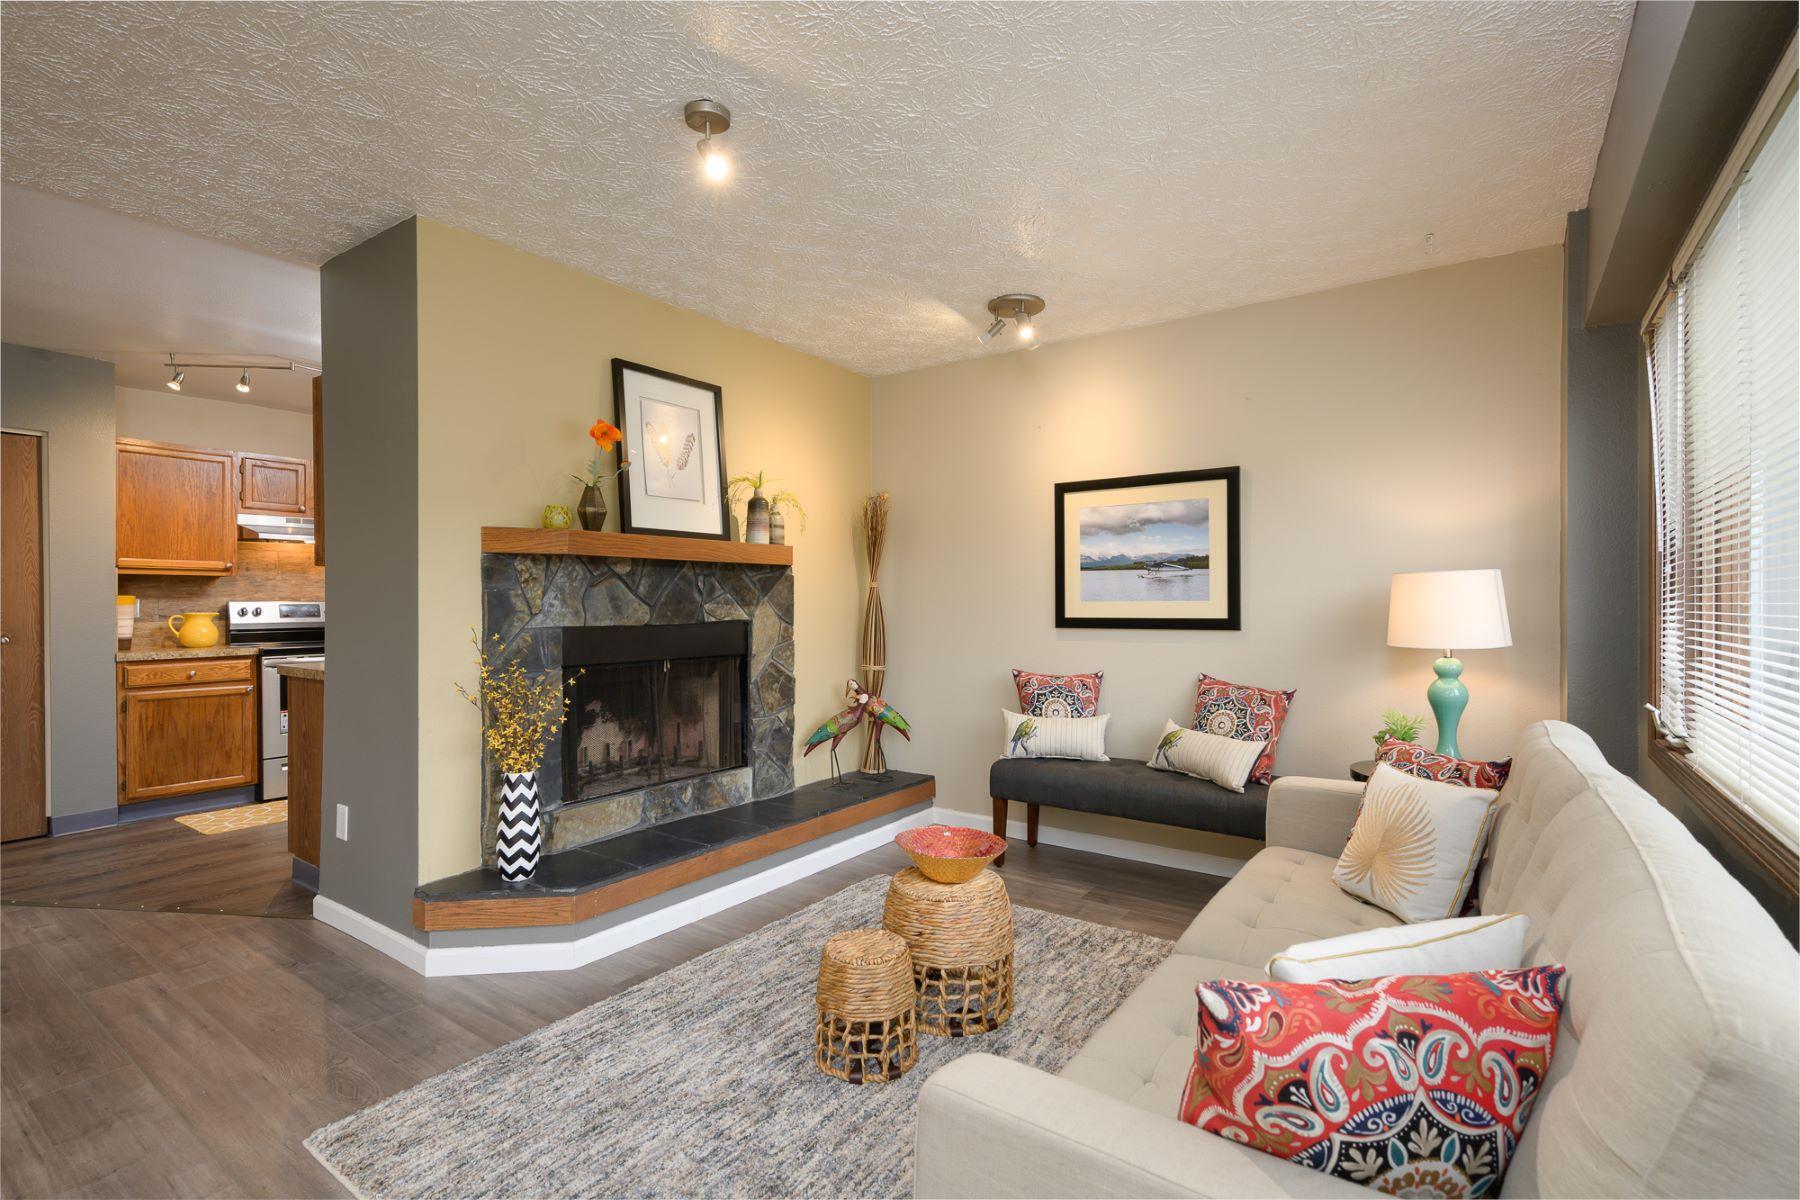 Condominiums vì Bán tại 837 Merlin Loop # C4, Anchorage, Alaska 99518 Hoa Kỳ